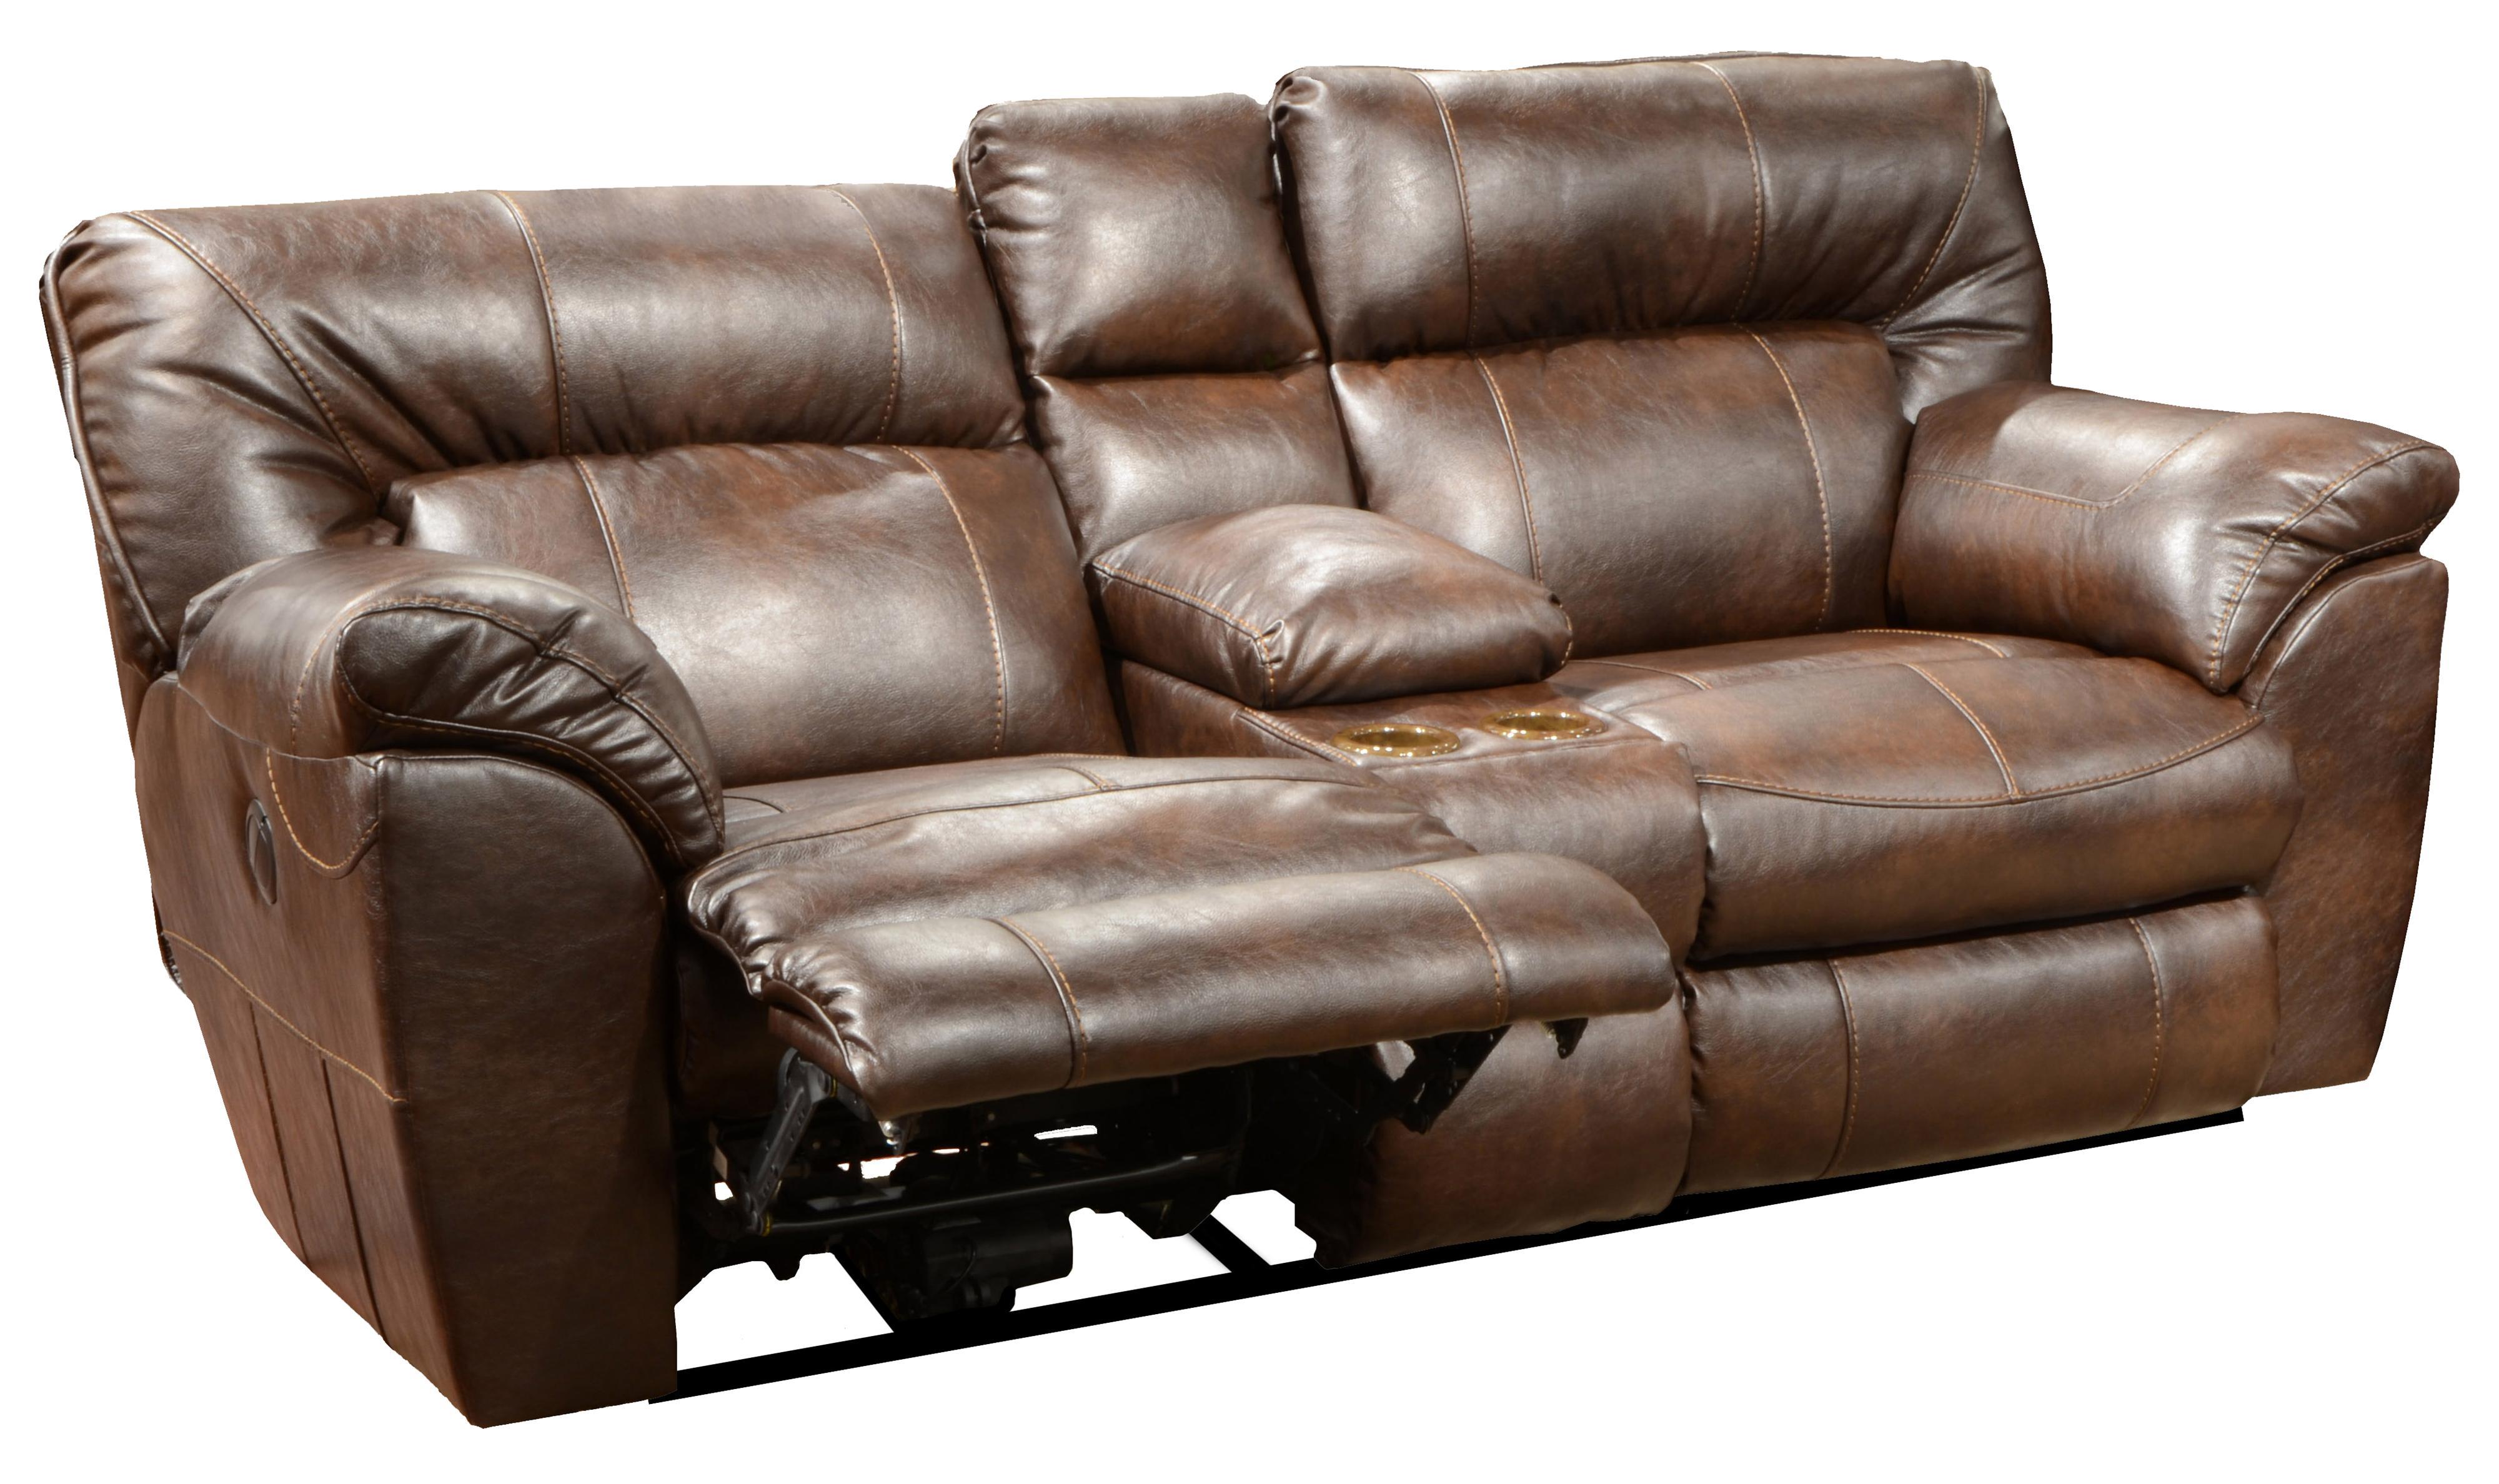 catnapper sofas and loveseats fundas para sofa chaise longue baratas nolan power extra wide reclining console